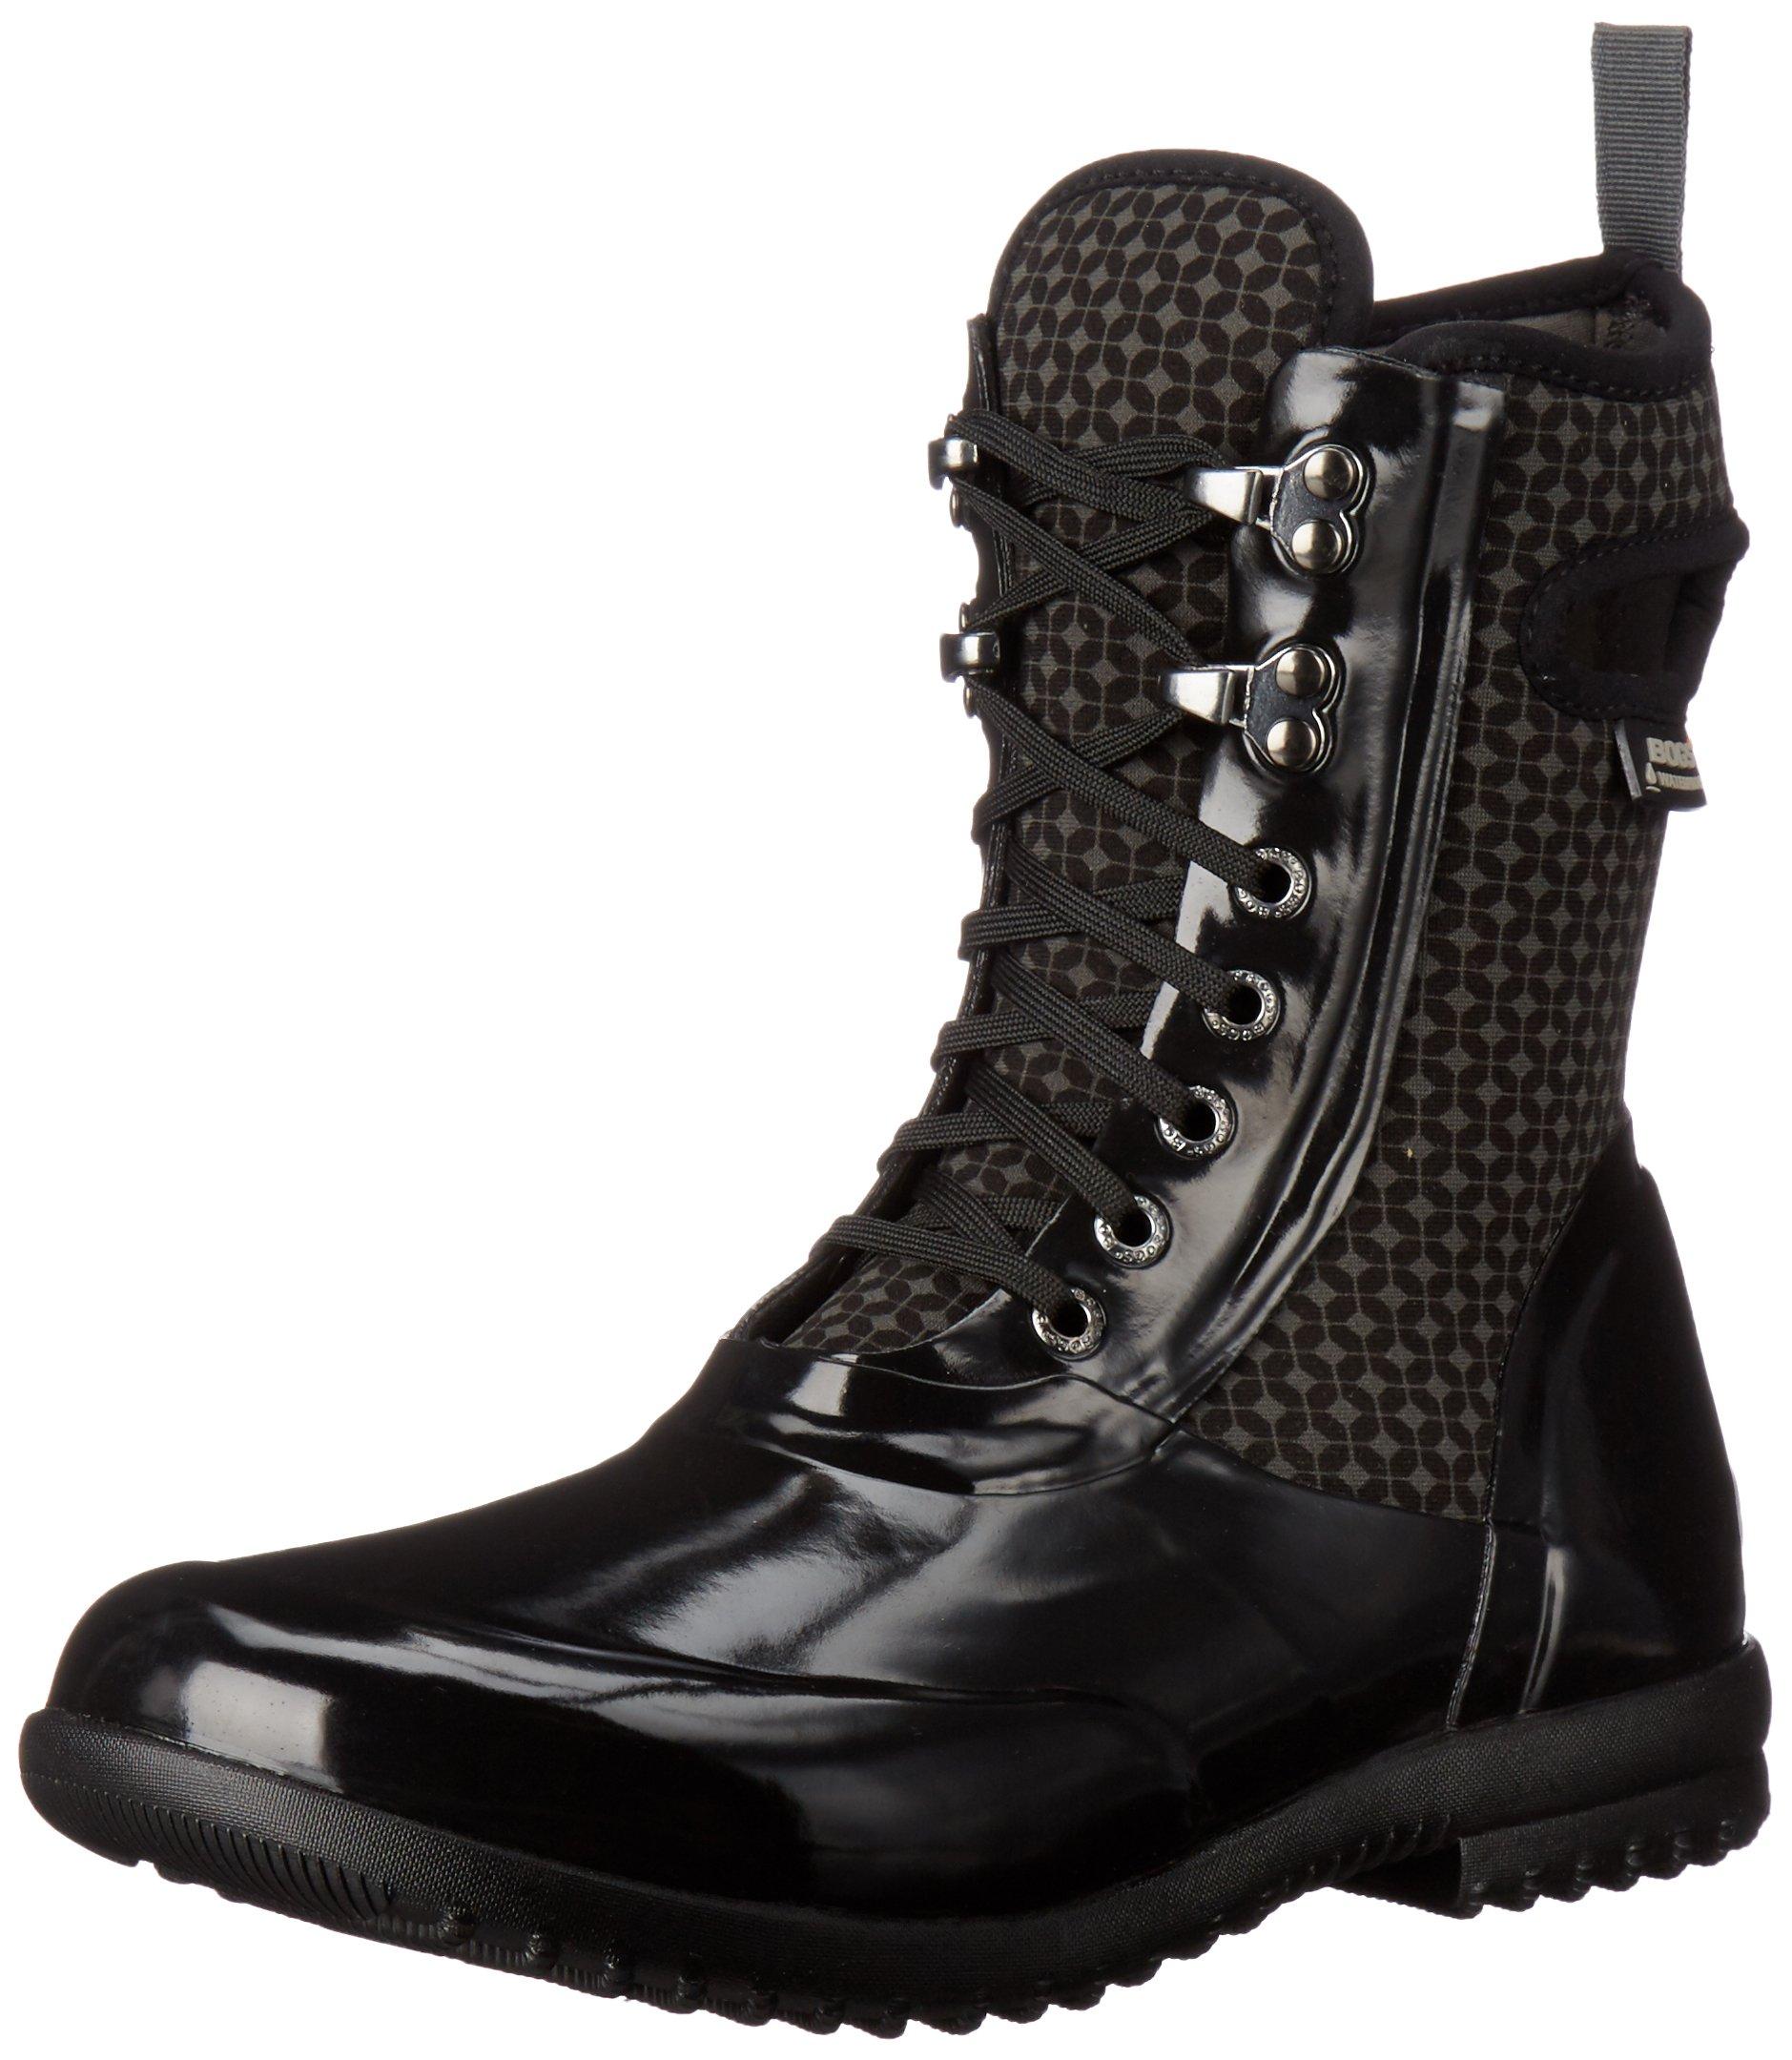 Bogs Women's Sidney Cravat Snow Boot, Black/Multi, 11 M US